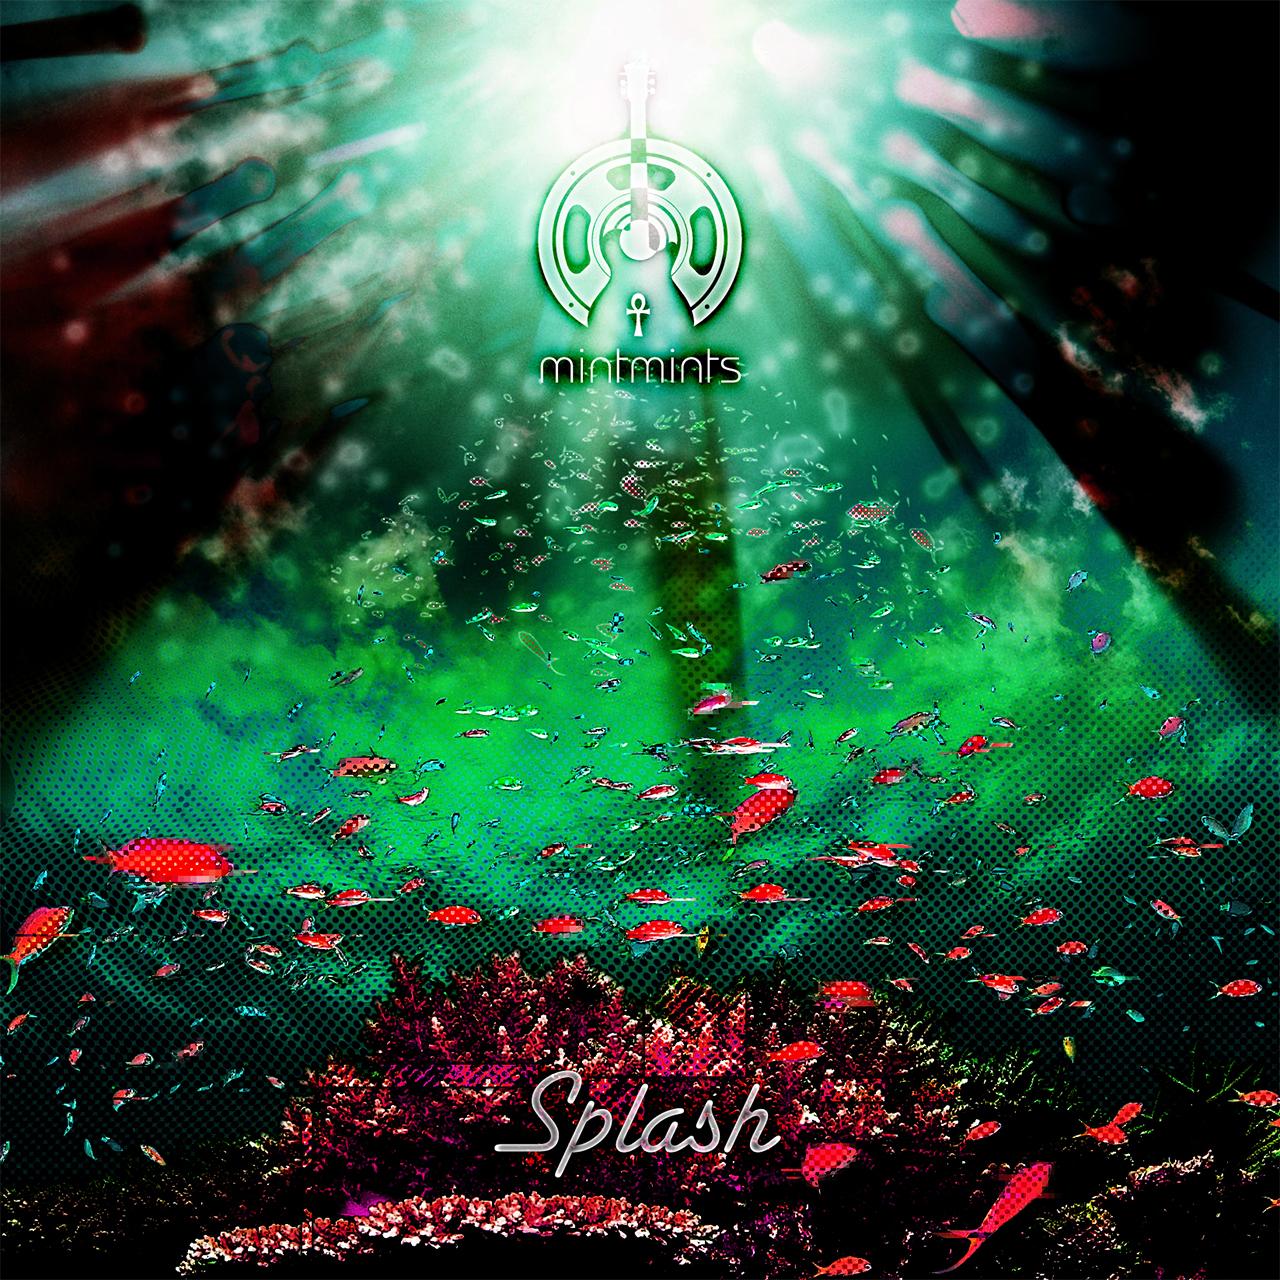 CD:『Splash』mintmints(ミントミンツ) - 画像1